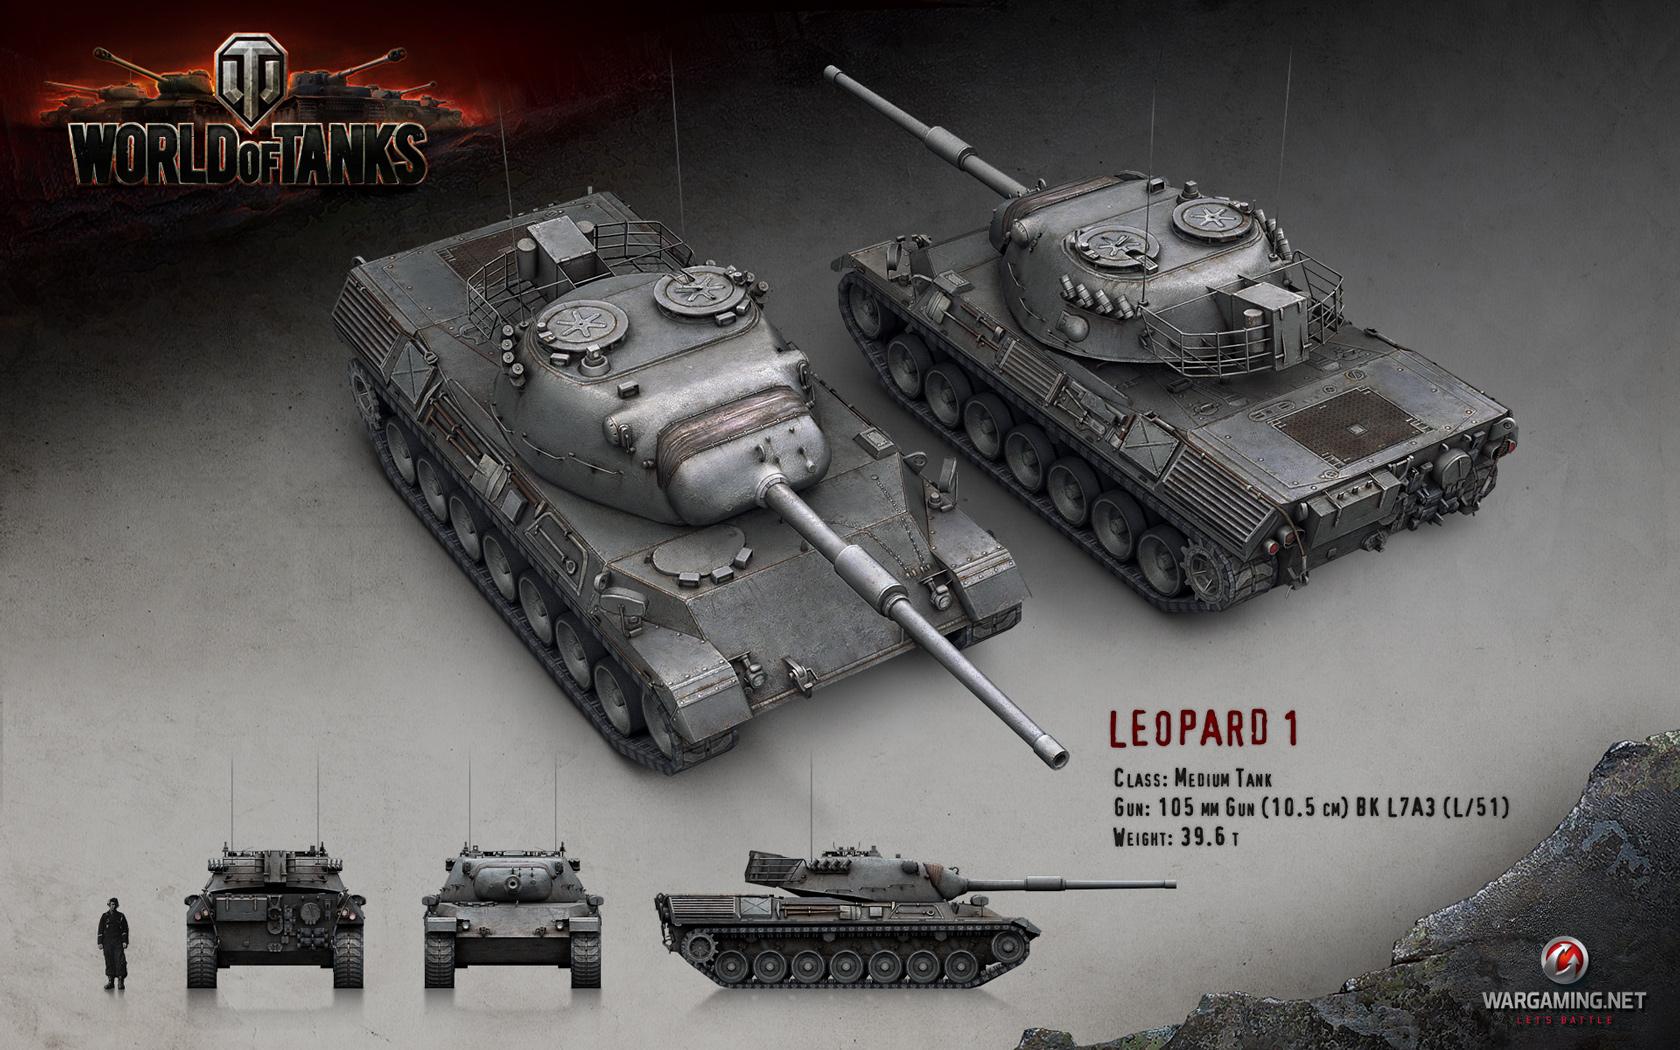 Leopard 1 wot